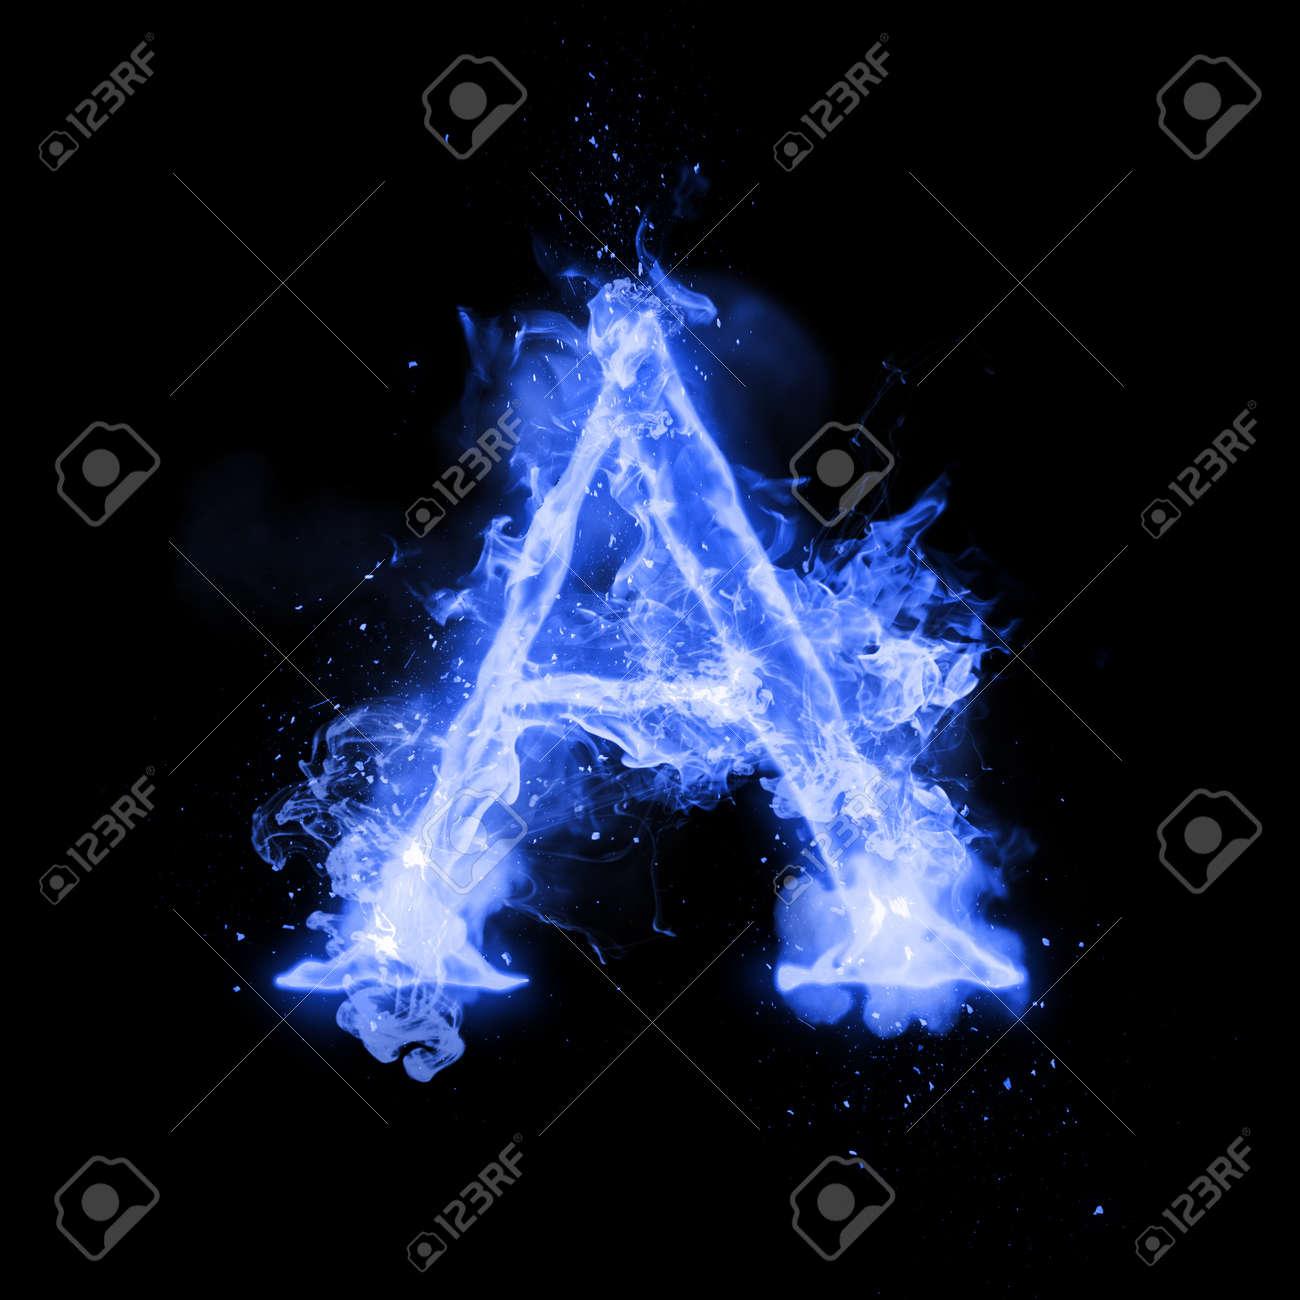 Fire Letter A Of Burning Blue Flame Flaming Burn Font Or Bonfire